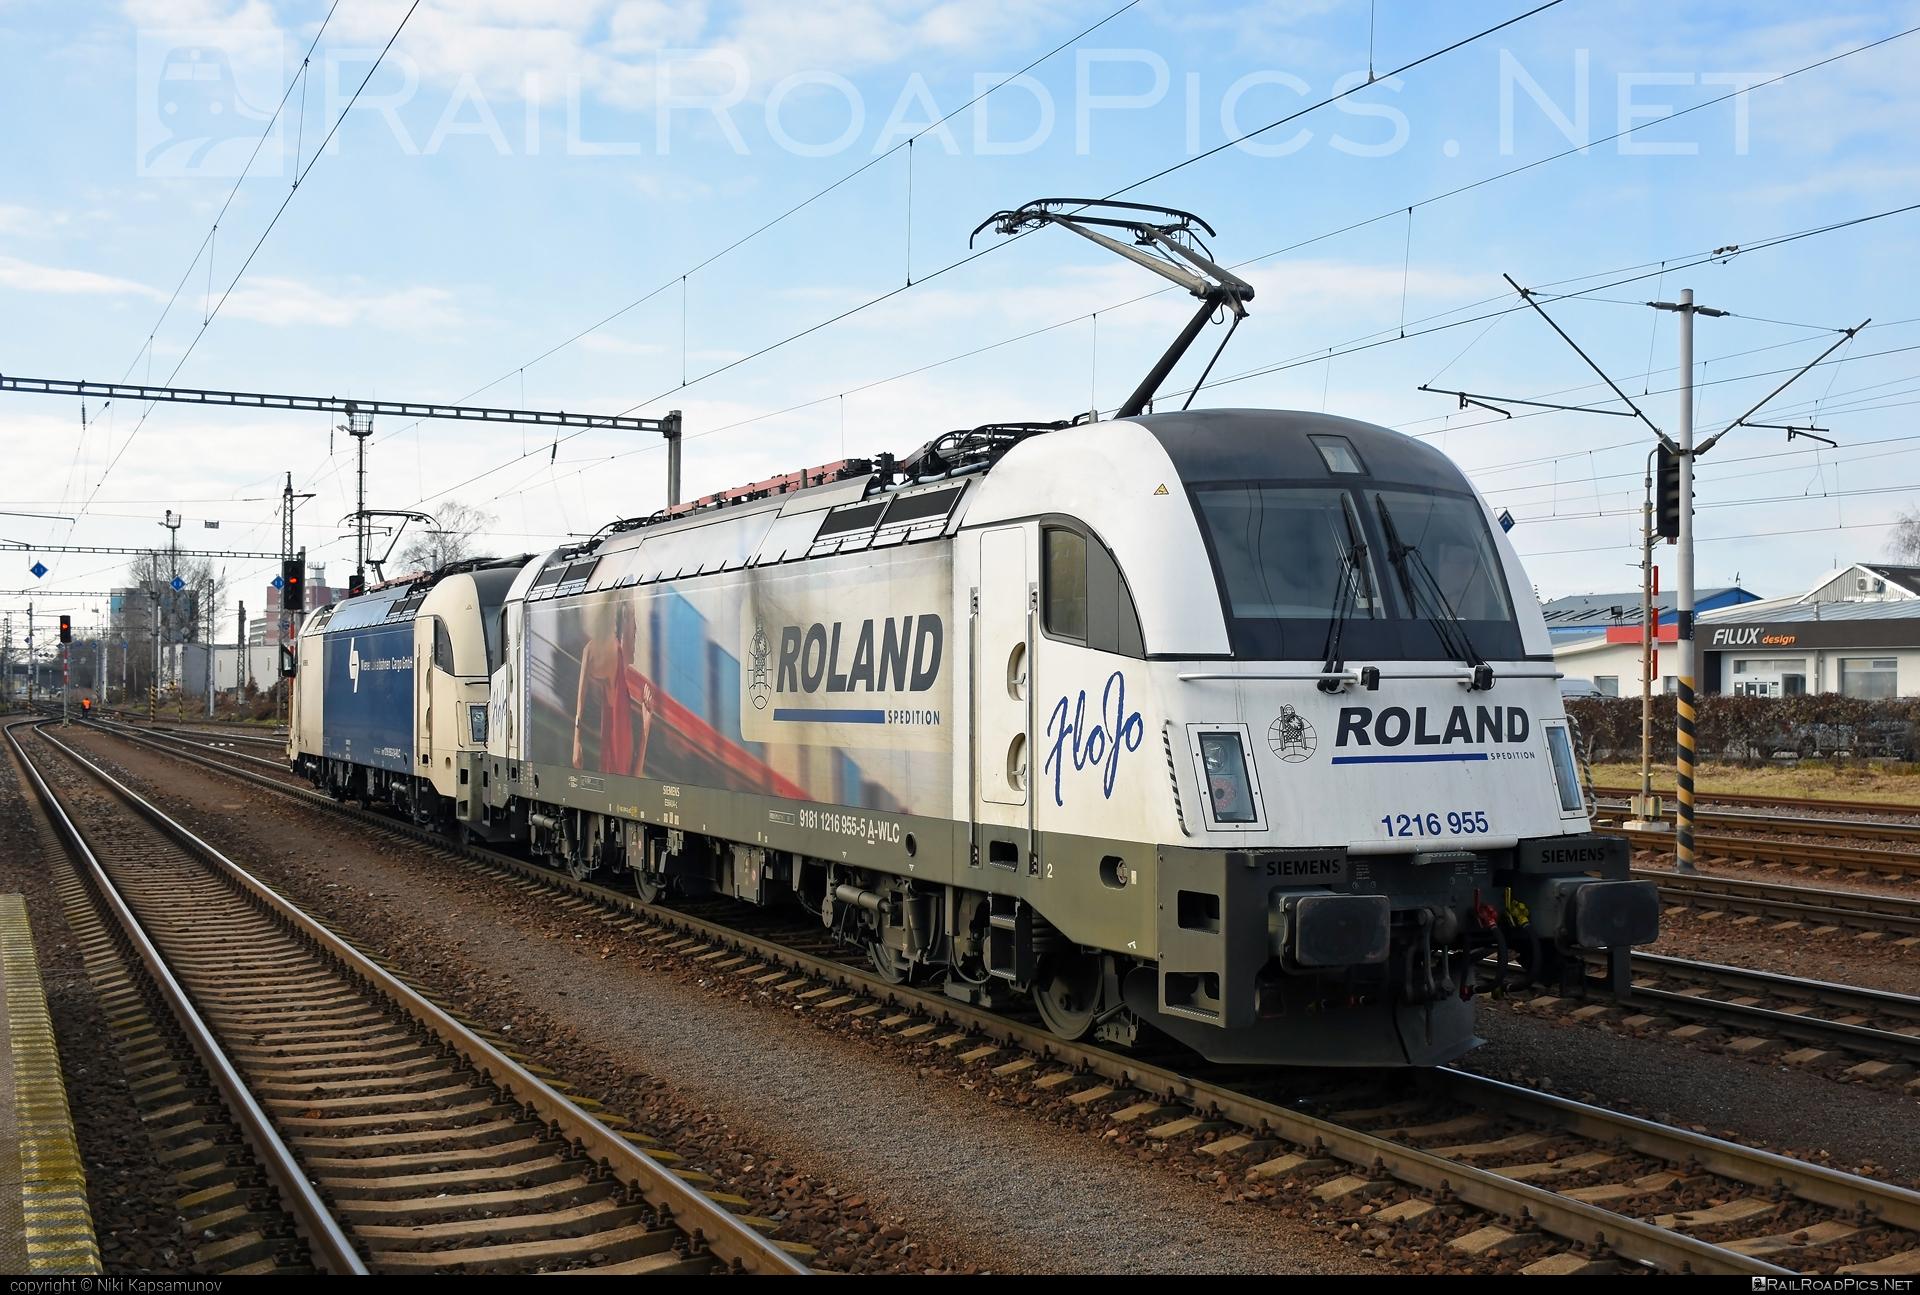 Siemens ES 64 U4 - 1216 955 operated by Wiener Lokalbahnen Cargo GmbH #FloJo #es64 #es64u #es64u4 #eurosprinter #roland #rolandspedition #siemens #siemenses64 #siemenses64u #siemenses64u4 #siemenstaurus #taurus #tauruslocomotive #wienerlokalbahnencargo #wienerlokalbahnencargogmbh #wlc